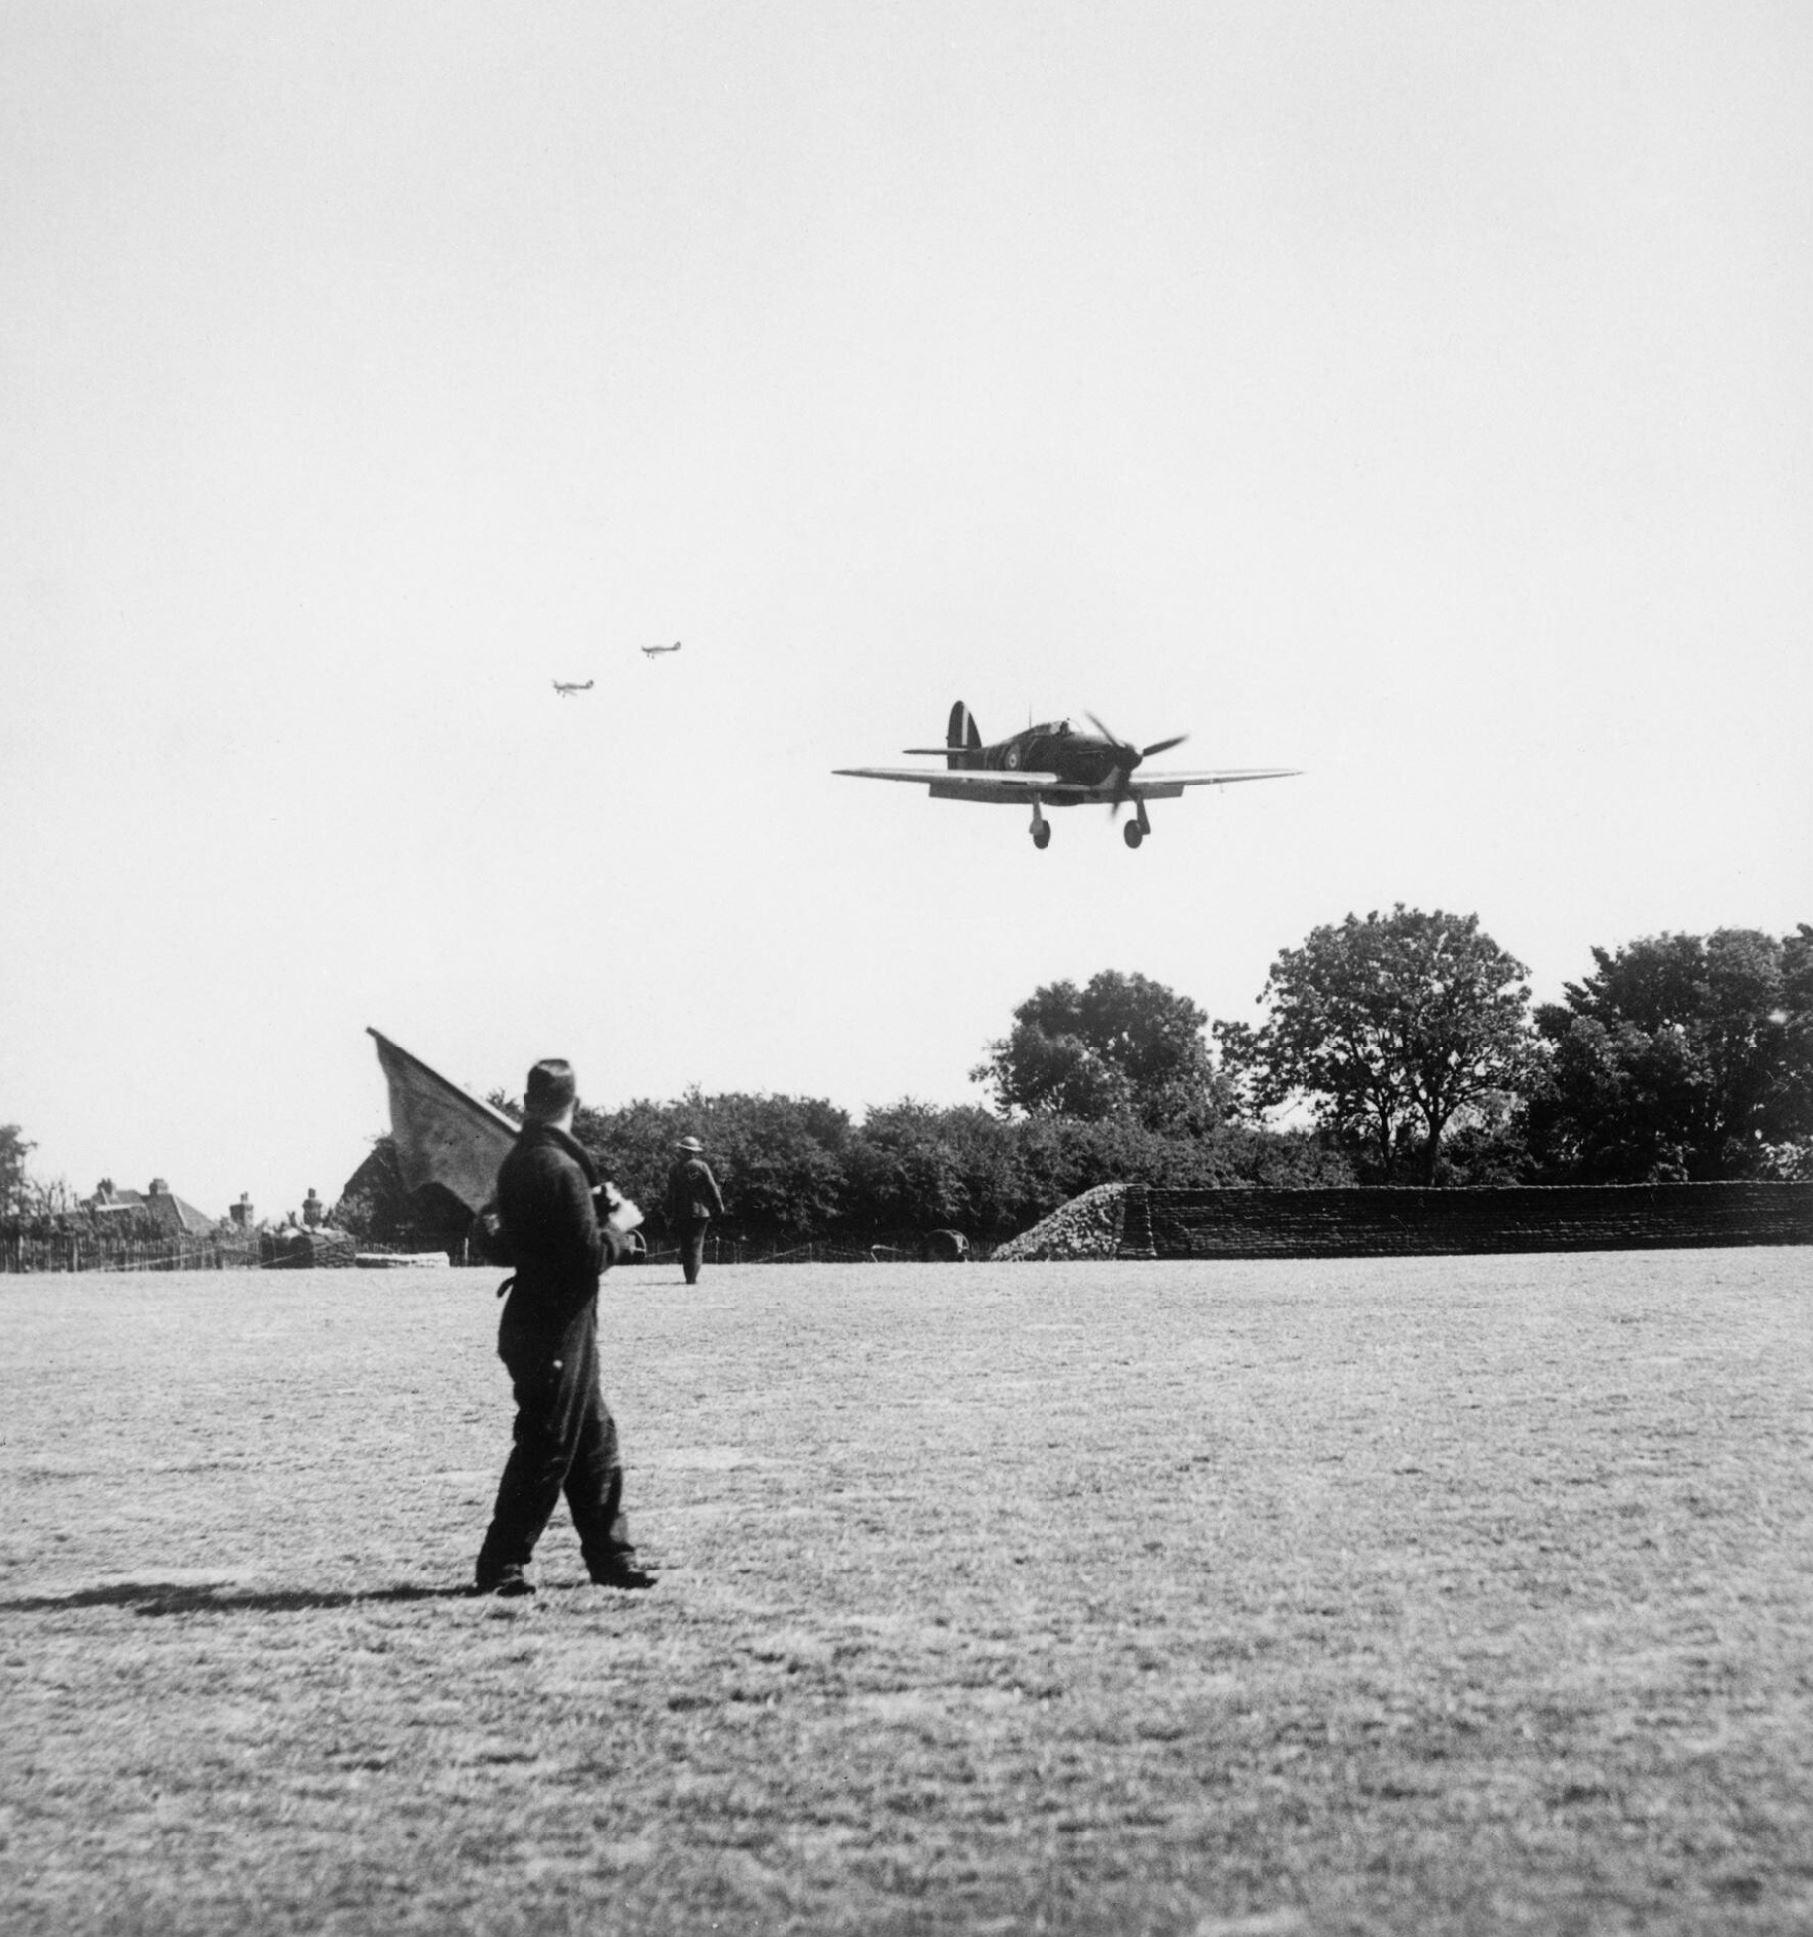 Hurricane I RAF 32Sqn GZZ landing at Biggin Hill England Aug 1940 IWM HU54519